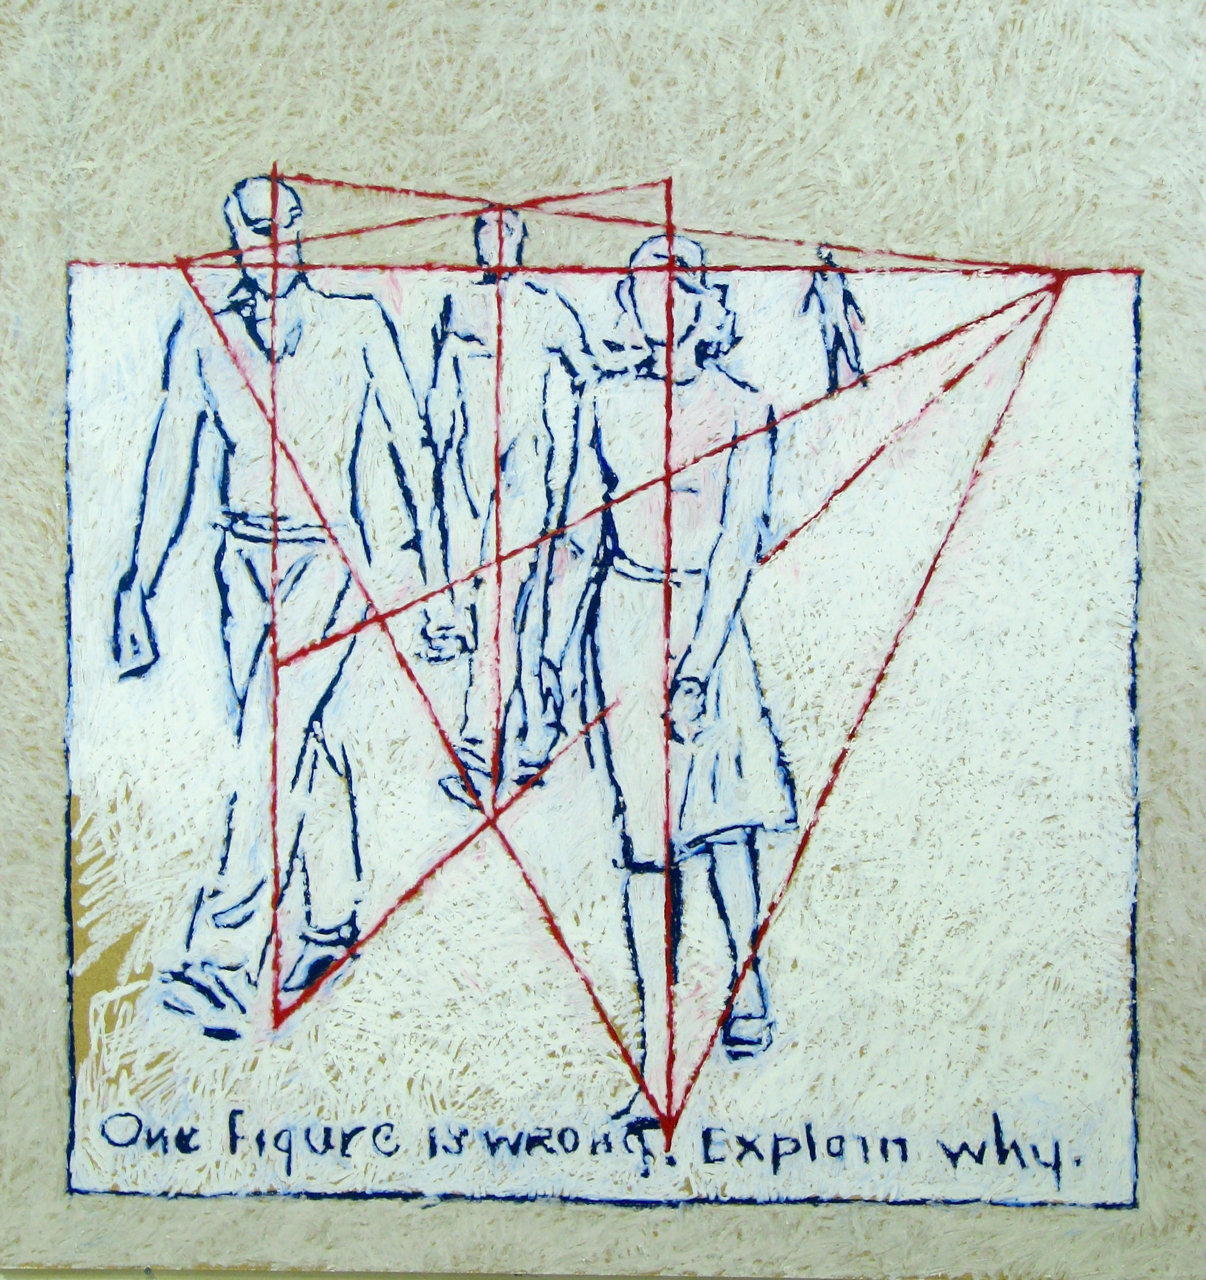 Explain Why, 2015, Oil pastel on Masonite panel, 50 x 48 in.